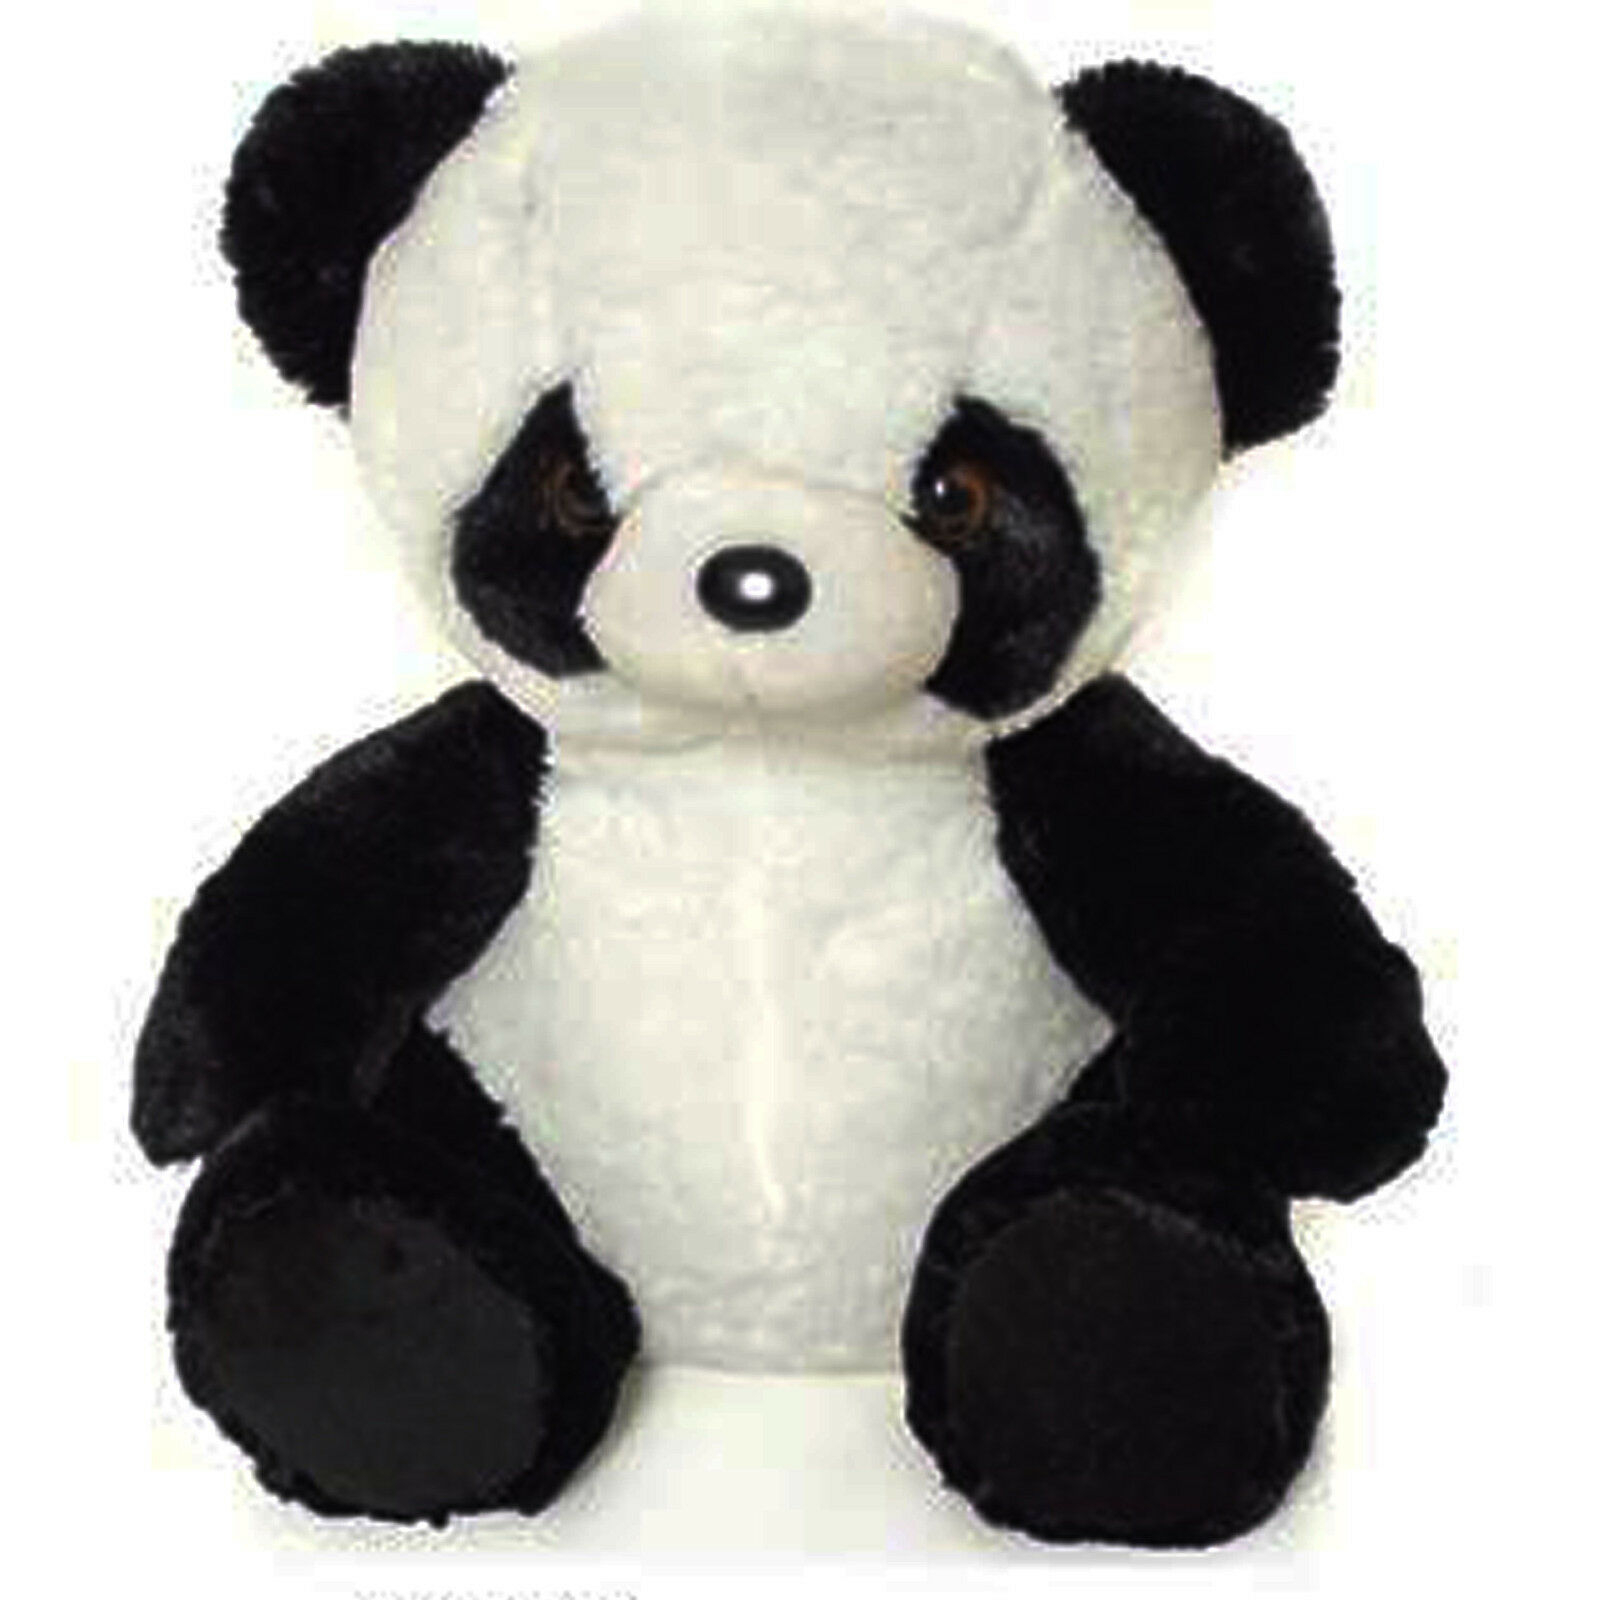 Panda peluches morbidissimo nero e bianco circa 43 cm